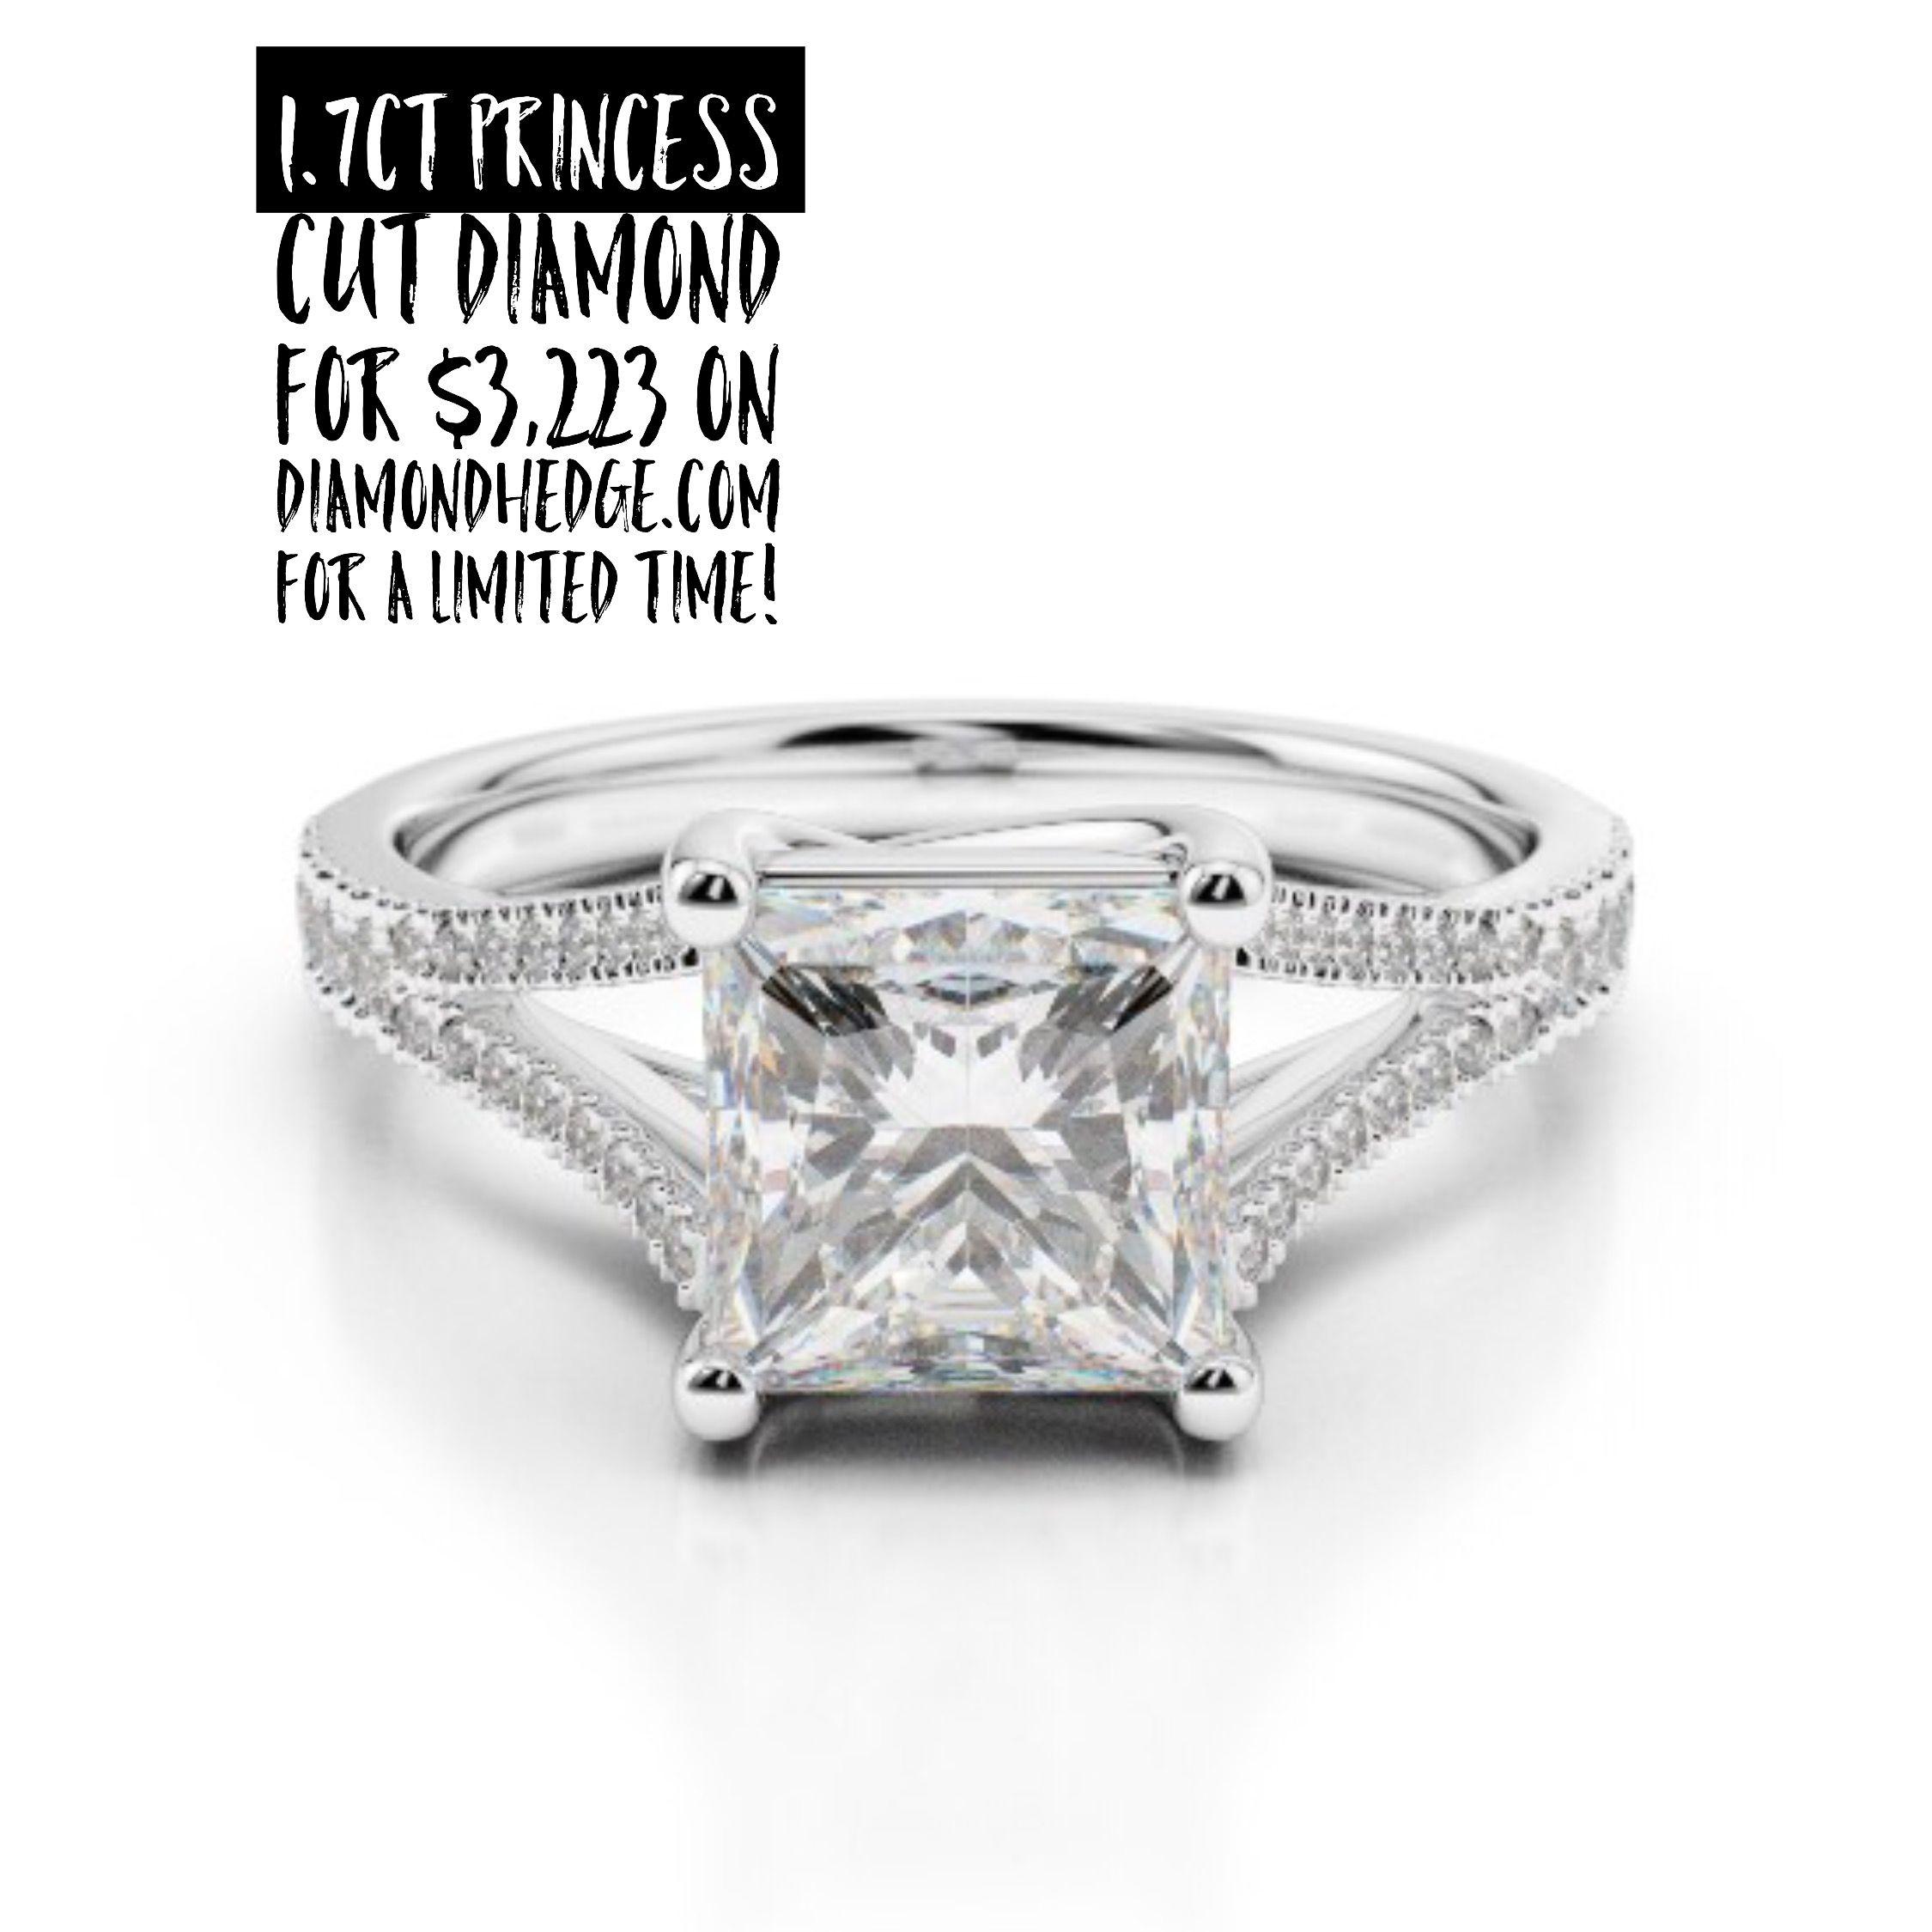 Ct princess cut diamond for on diamondhedge for a